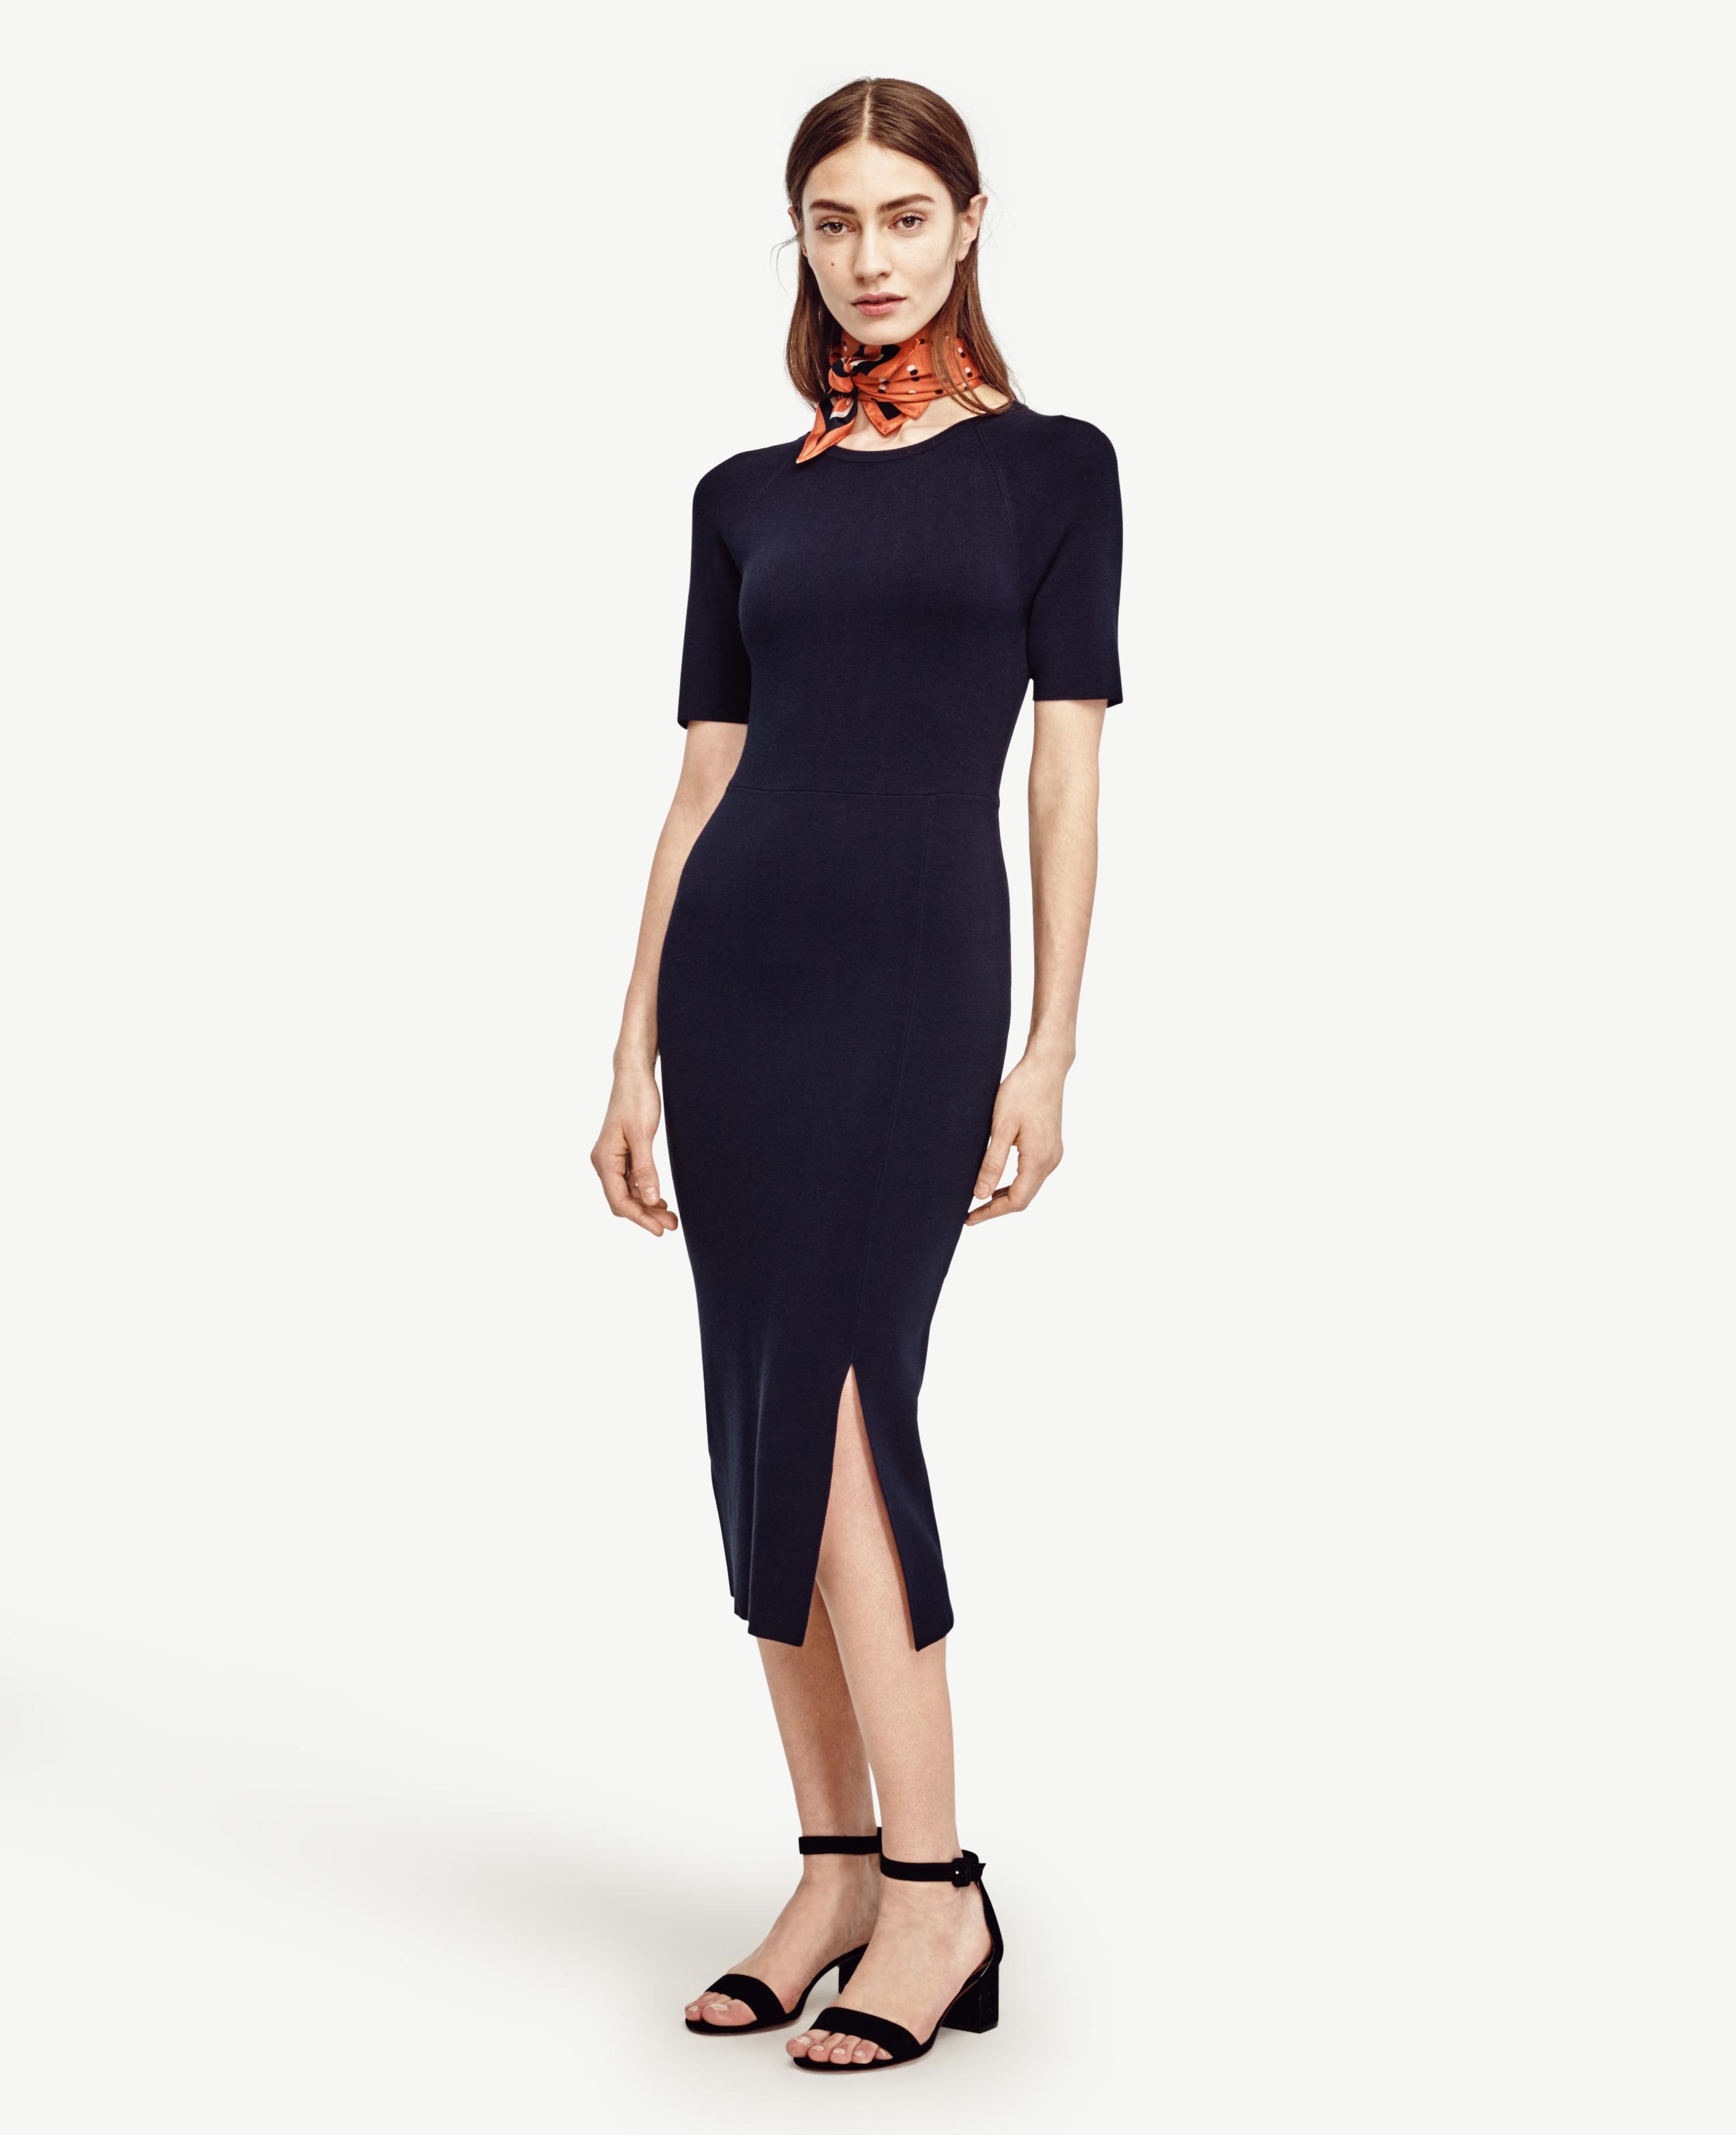 Ann taylor Petite Short Sleeve Sweater Dress in Black | Lyst